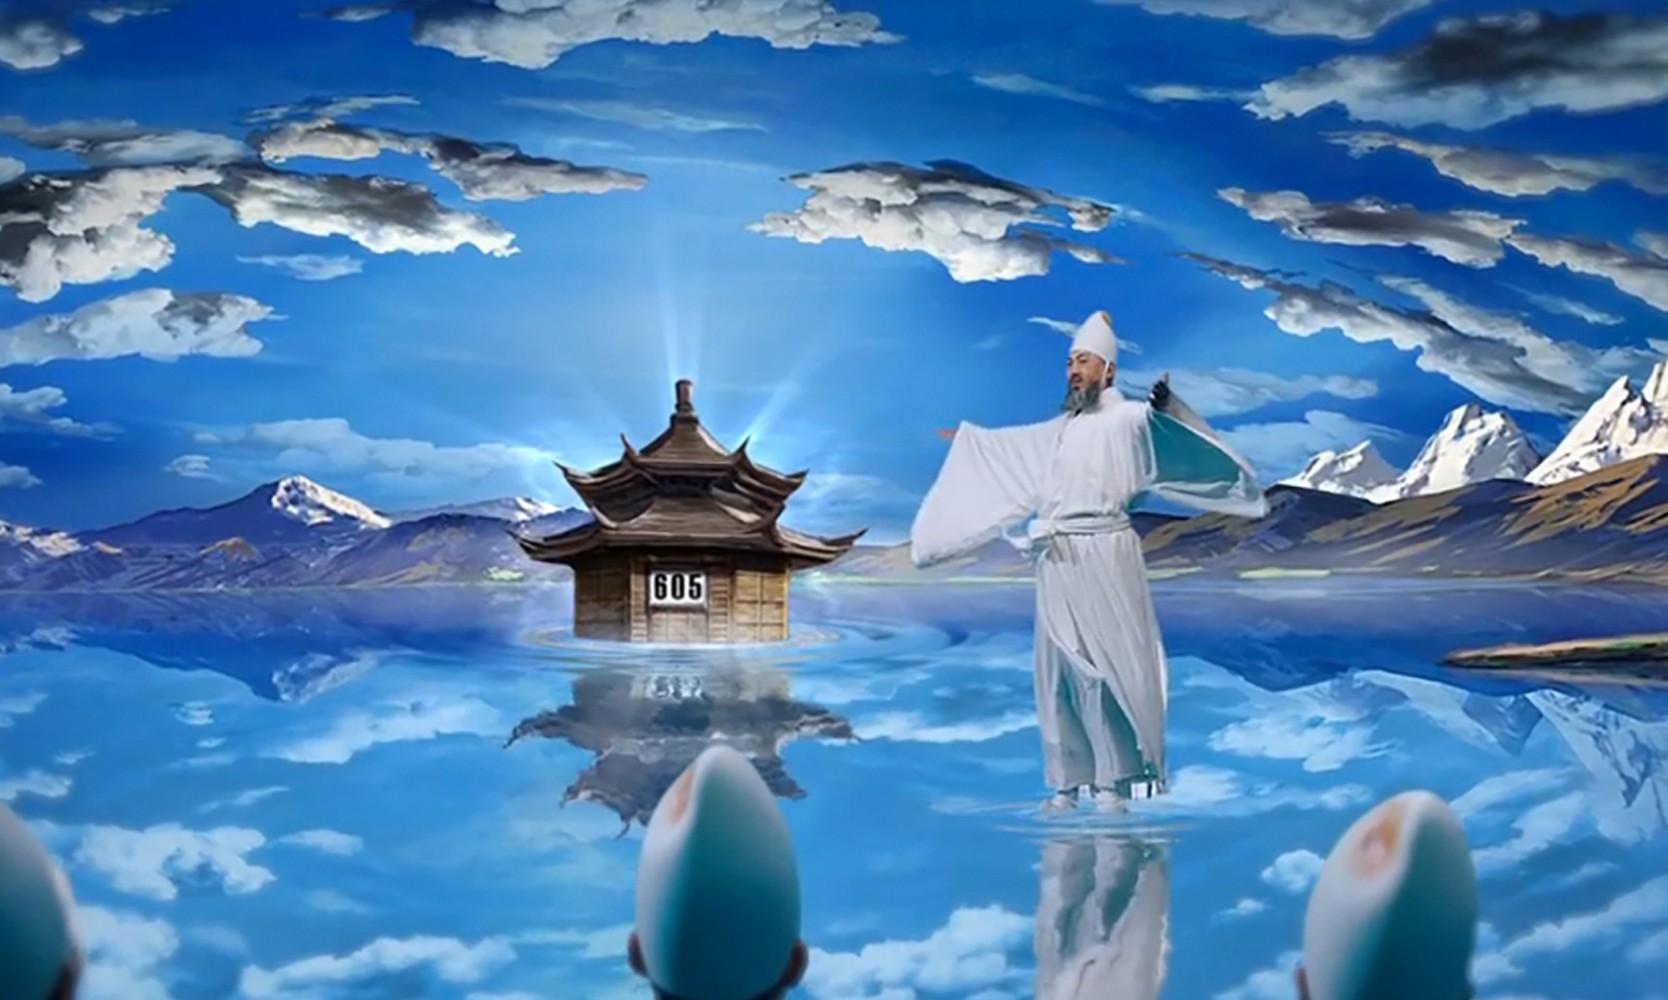 Wu Fang Zhai – Dragon Boat Festival Promotional Video